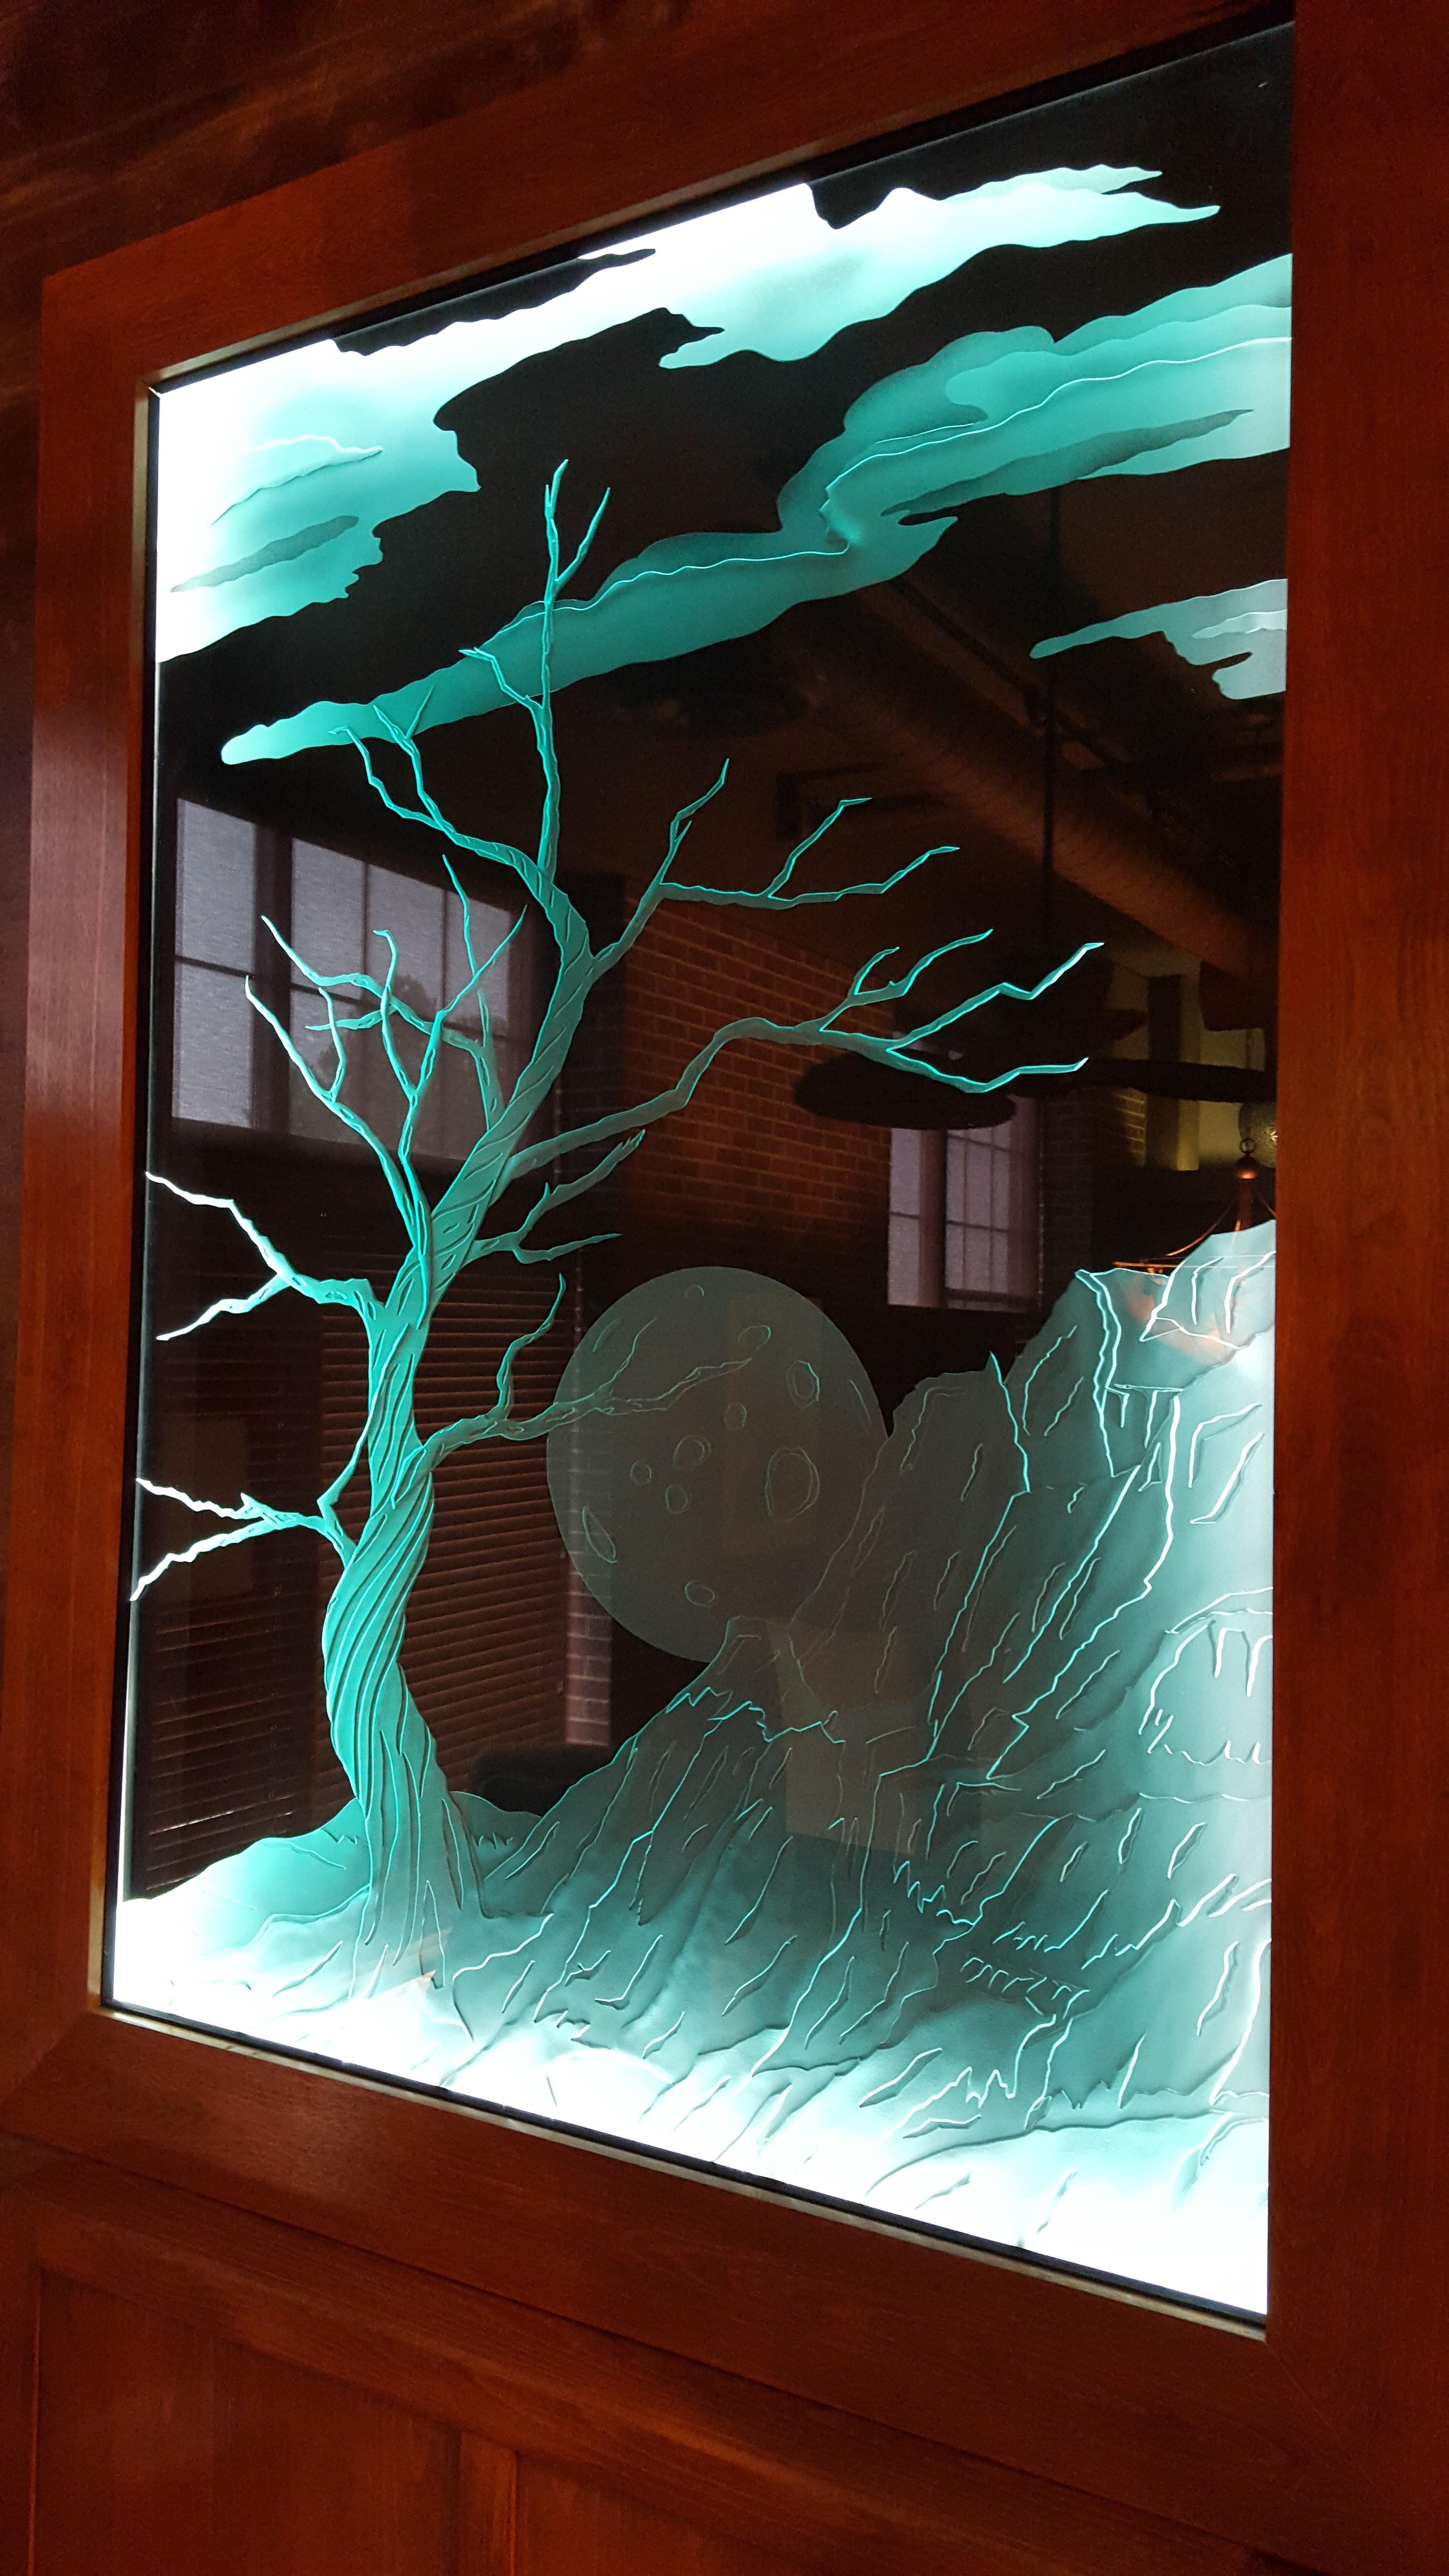 GlassGraphics_GlassCarvings01